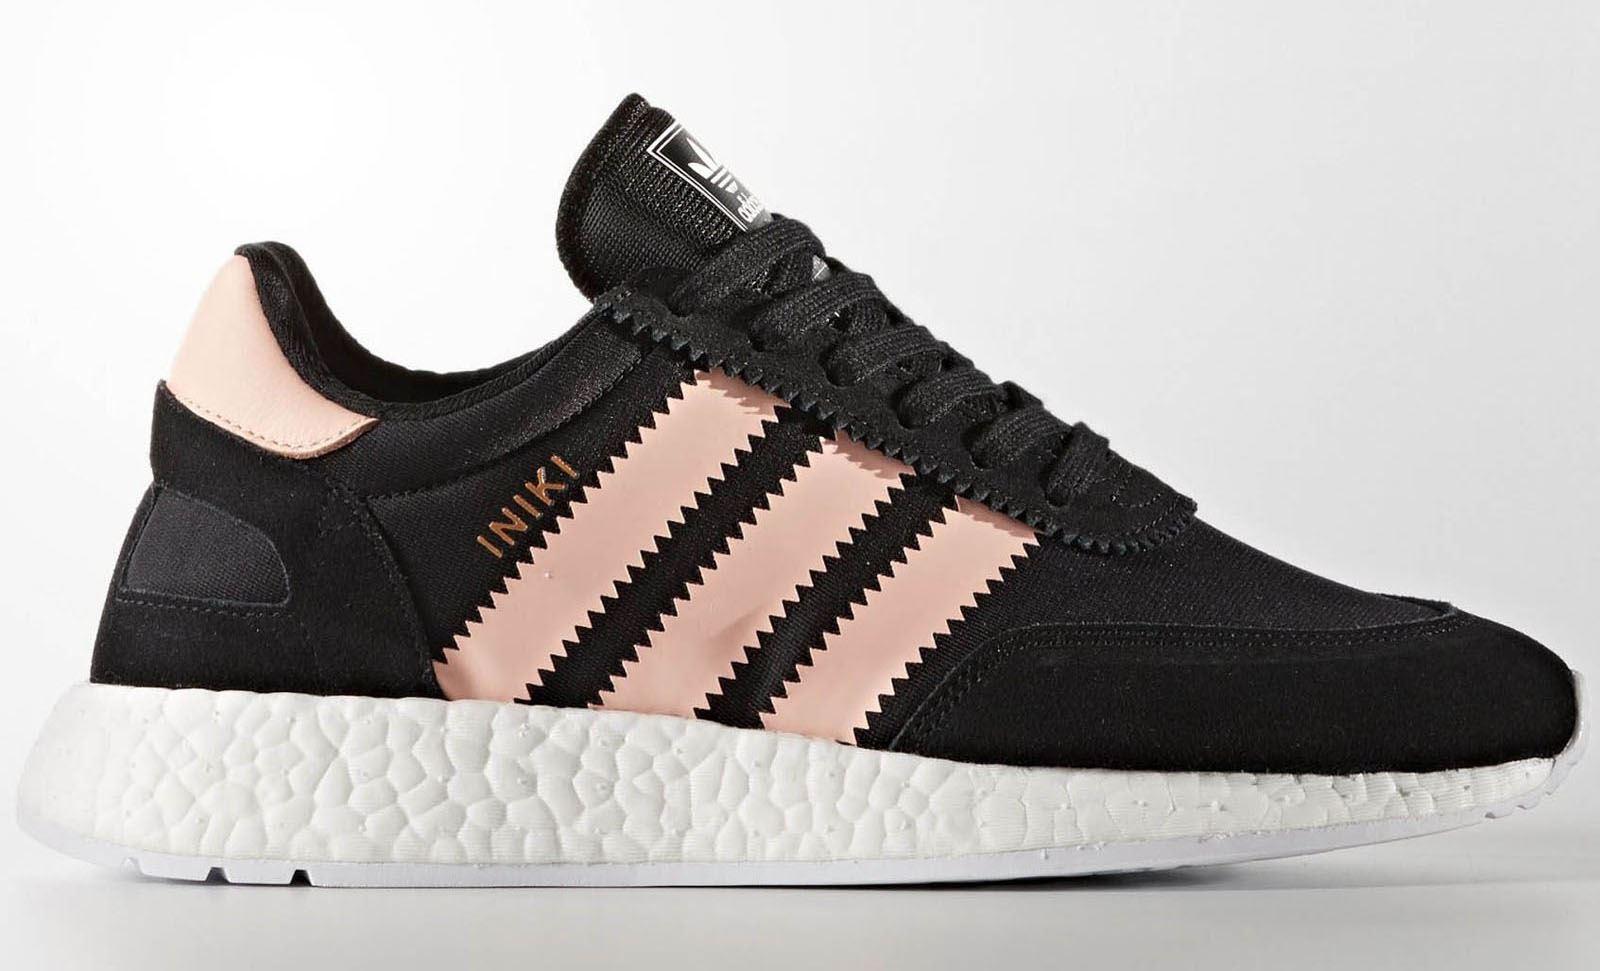 Adidas I-5923 Iniki Runner BB0000 Mujer Zapatillas ~ Originals ~ Reino Unido sólo 3.5 a 8